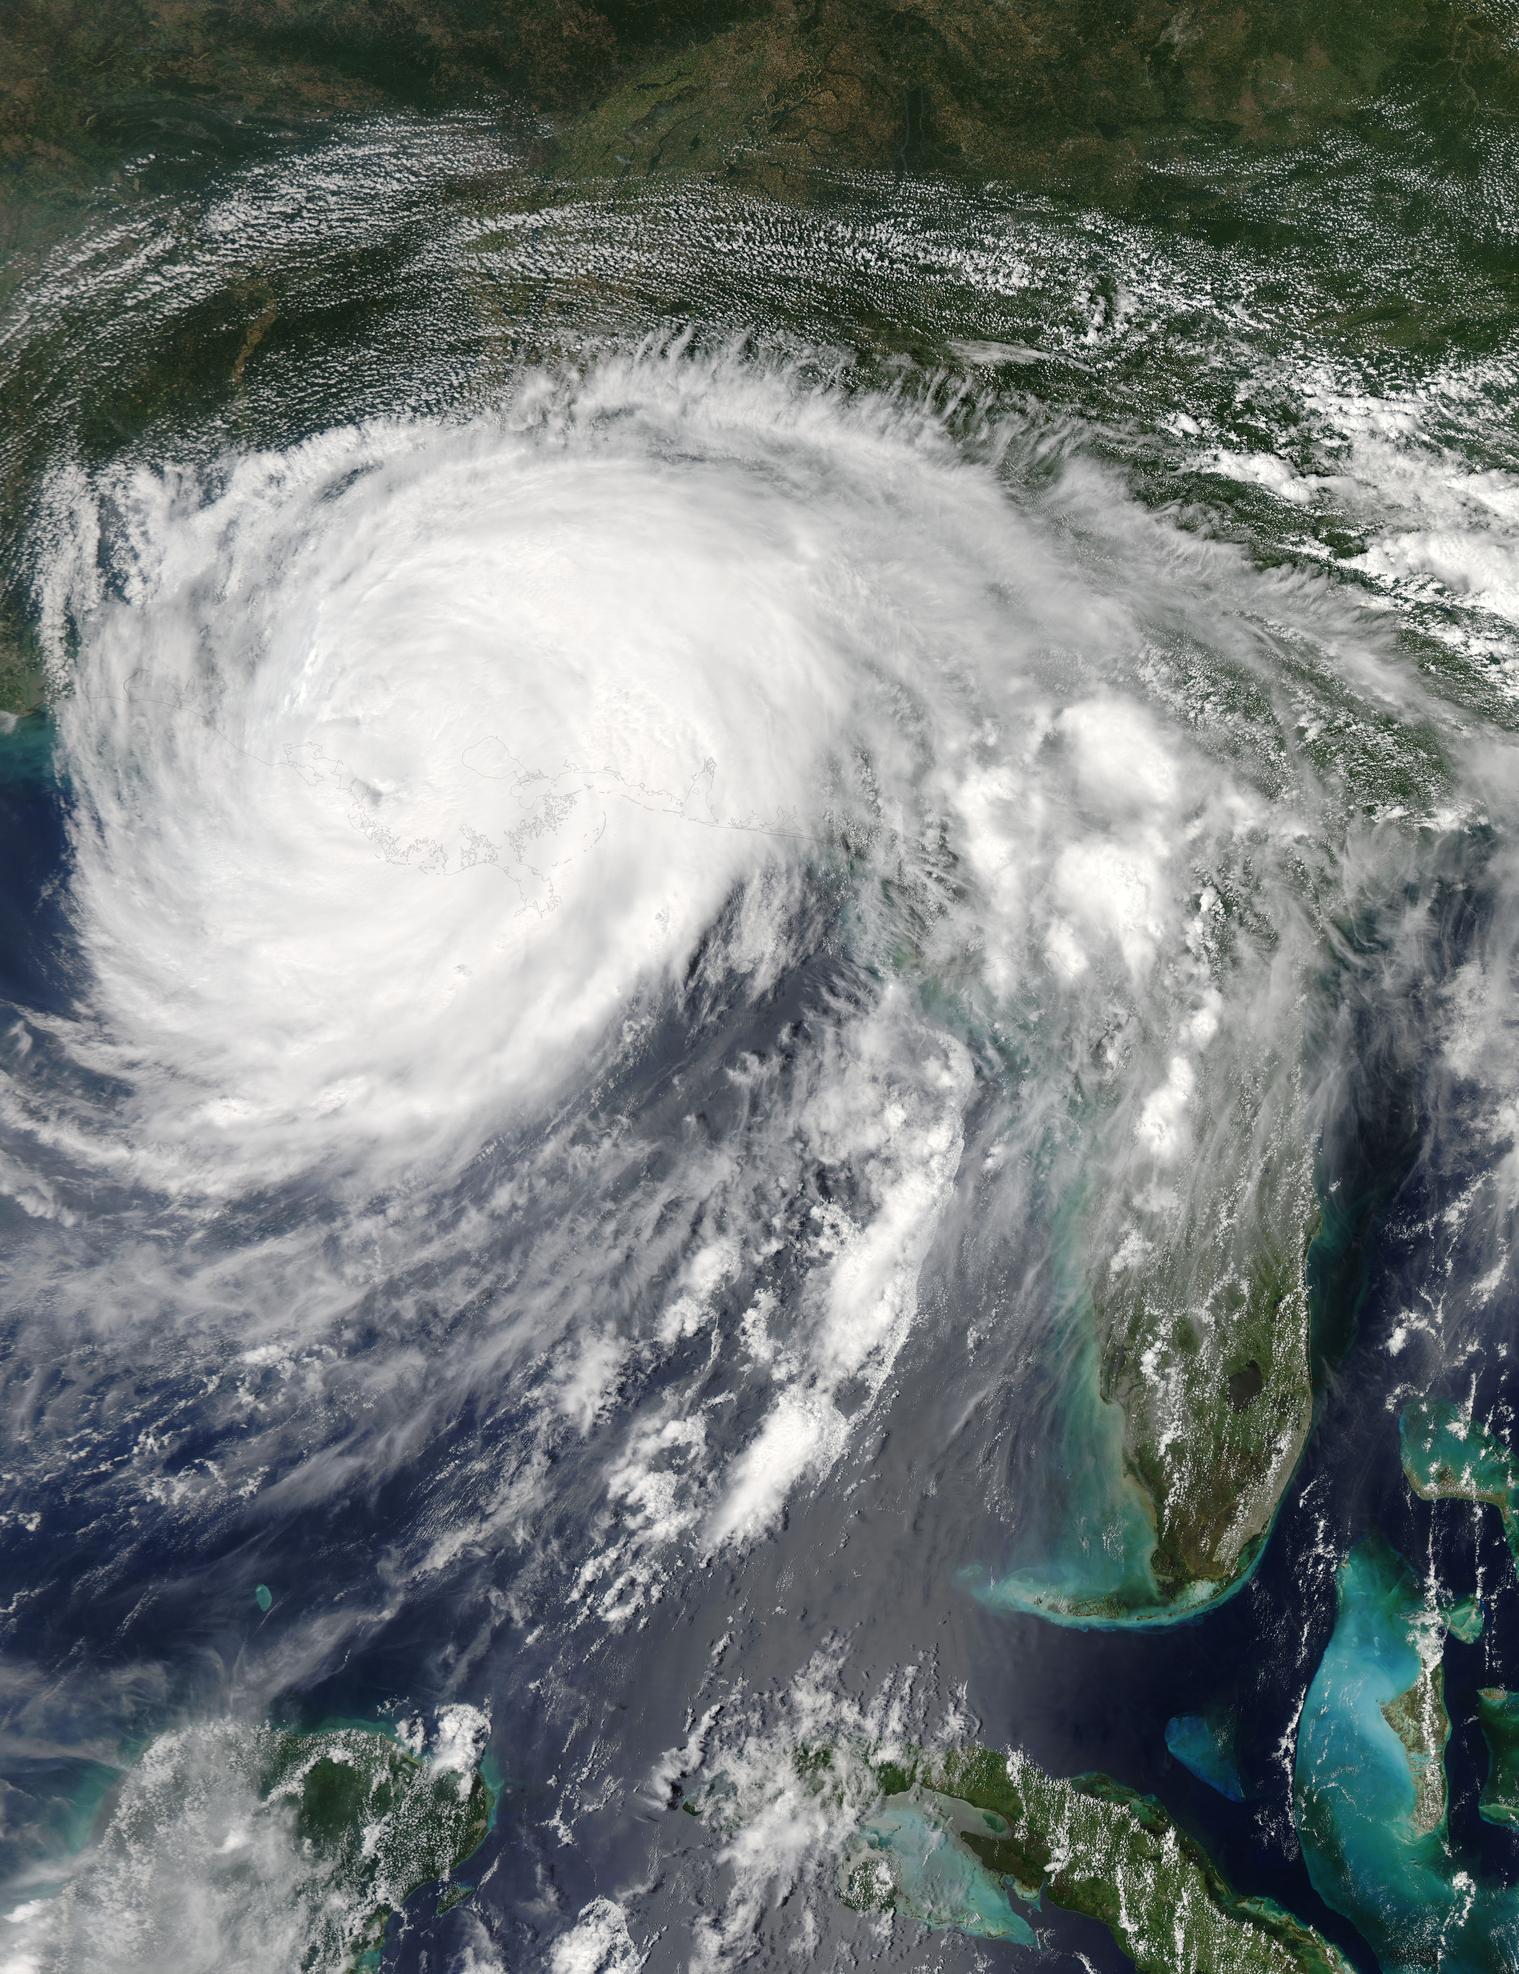 August 29, 2012 - Hurricane Isaac over Louisiana (afternoon overpass).